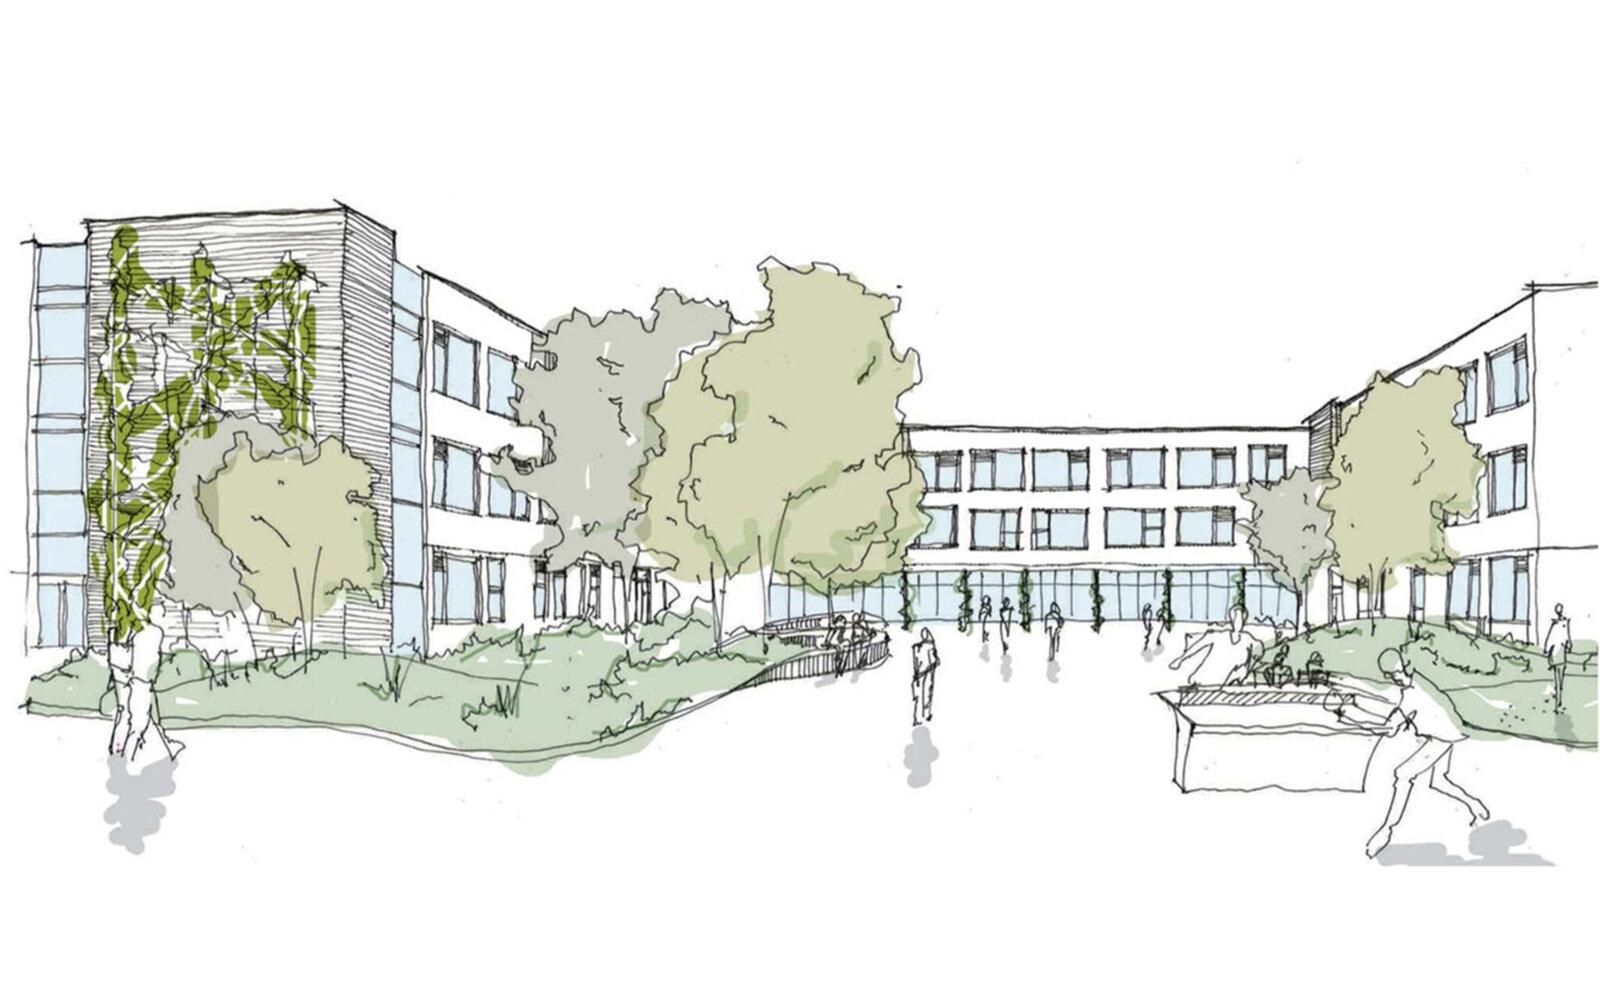 Swan School courtyard